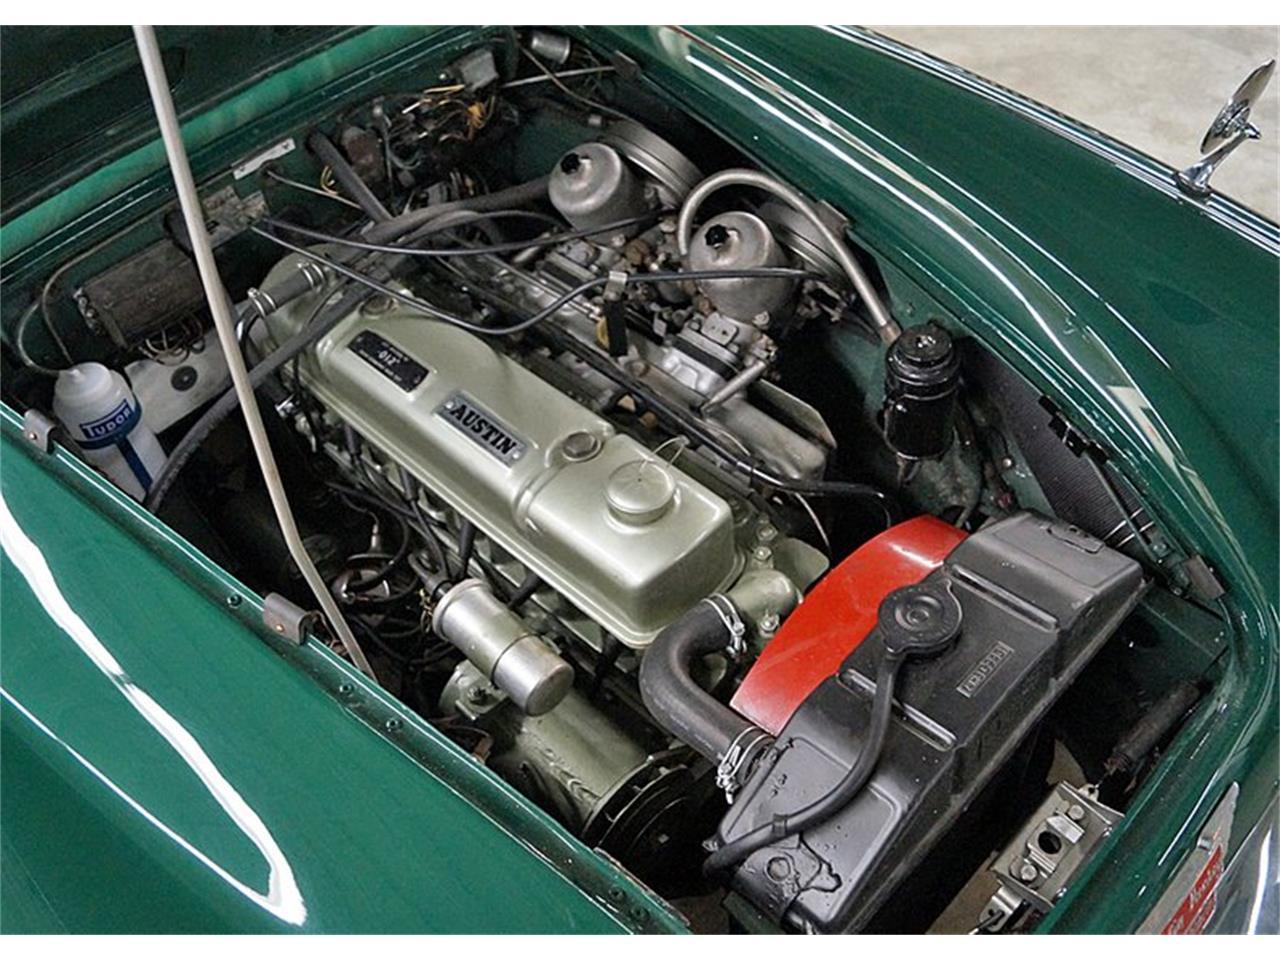 1967 Austin-Healey 3000 Mark III BJ8 (CC-1261249) for sale in Saratoga Springs, New York